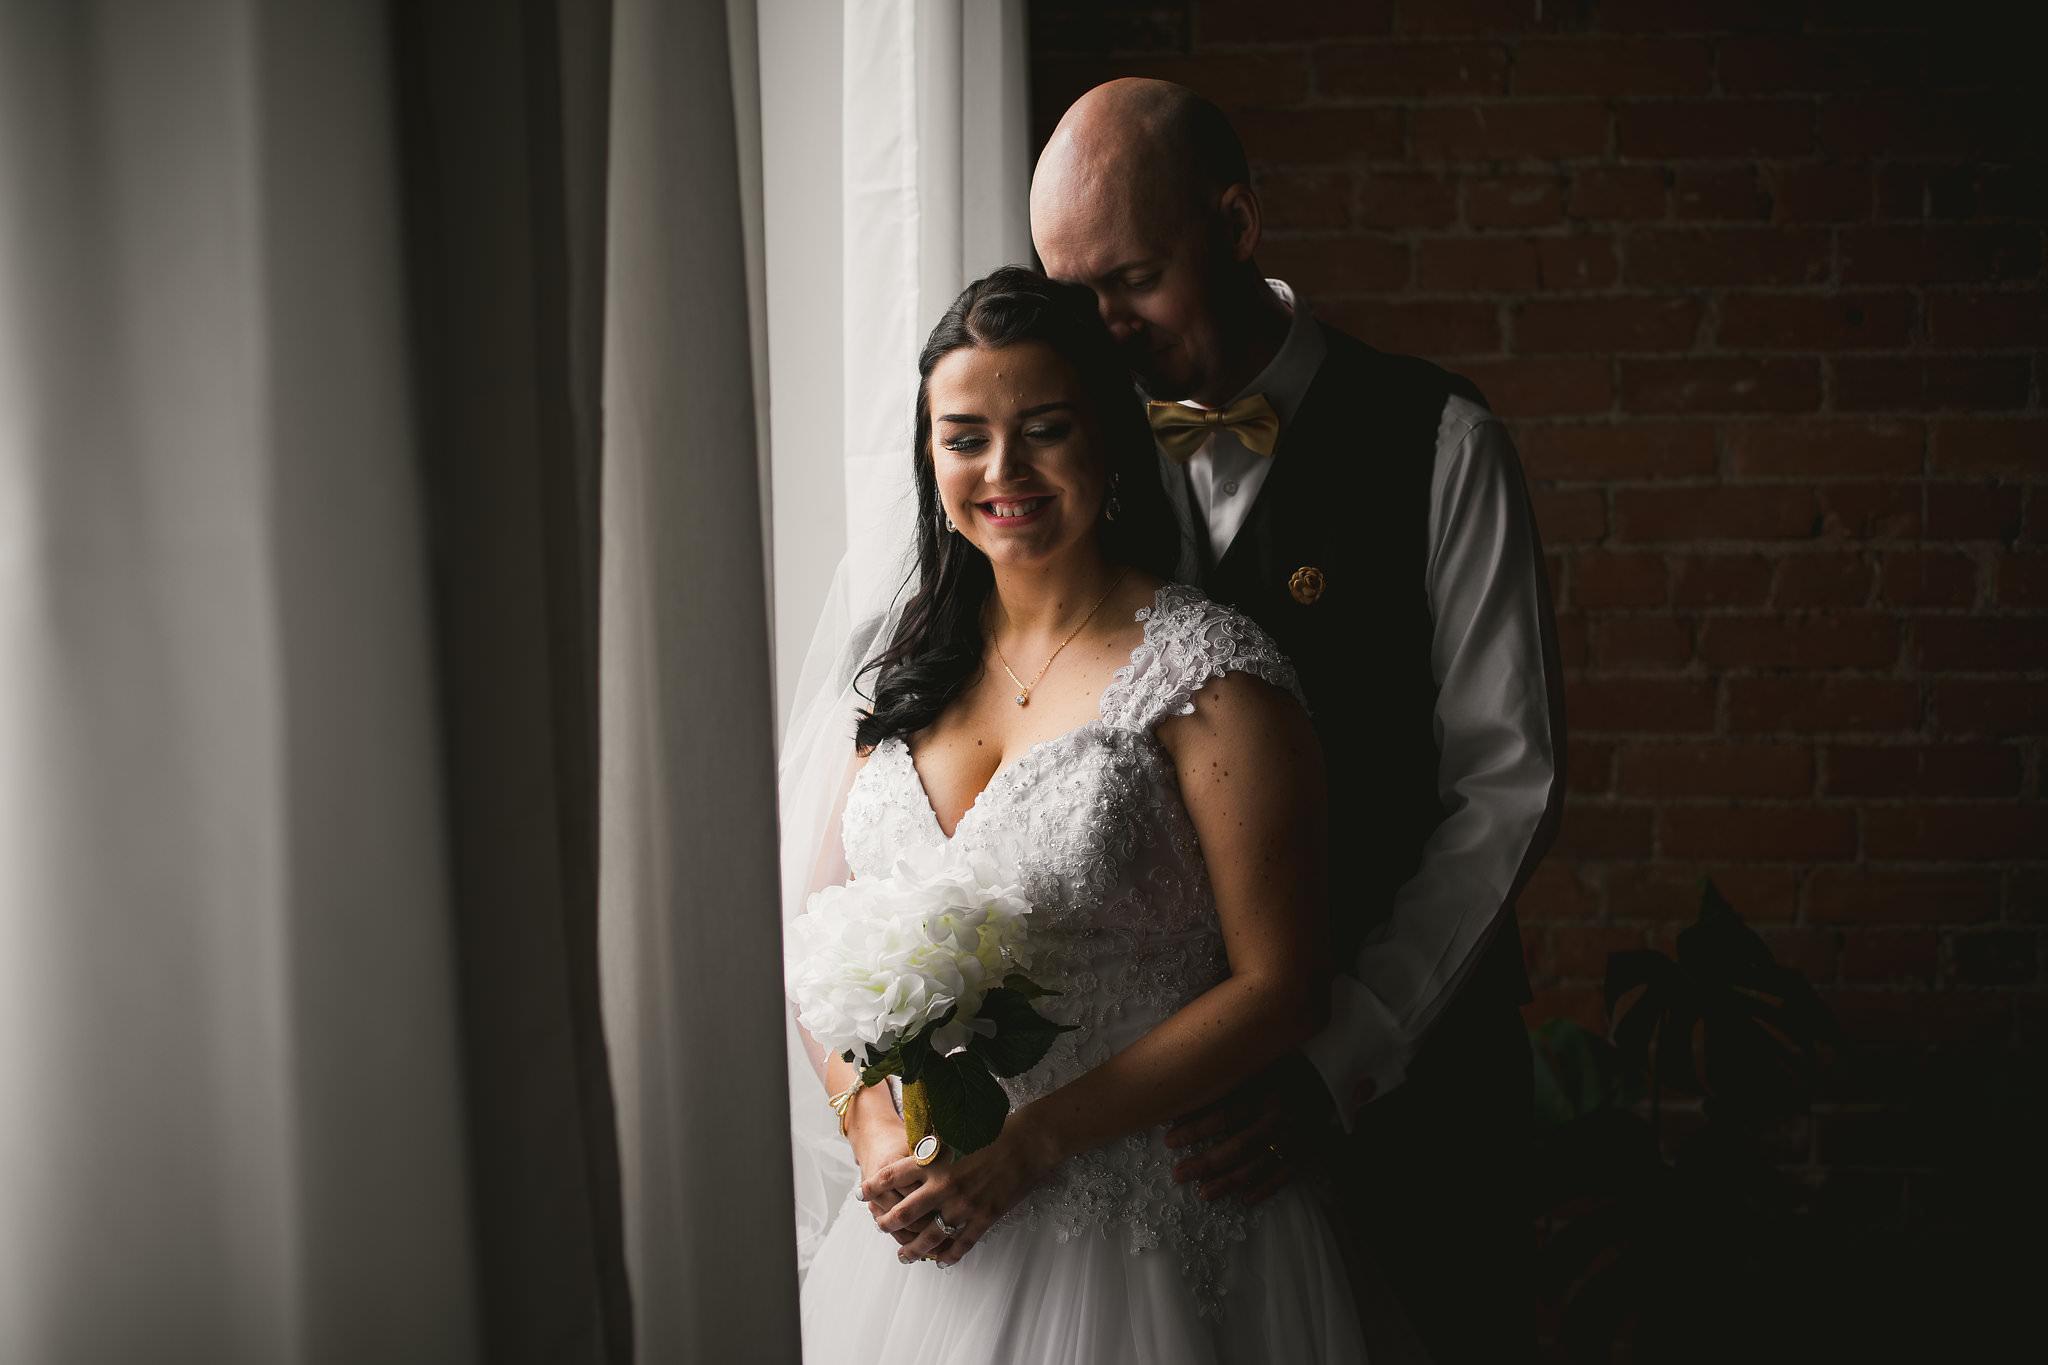 Kristen Adam Kindred Loft Whitby Wedding Photos 298 - Durham Wedding Photographer: Kindred Loft Wedding Photos